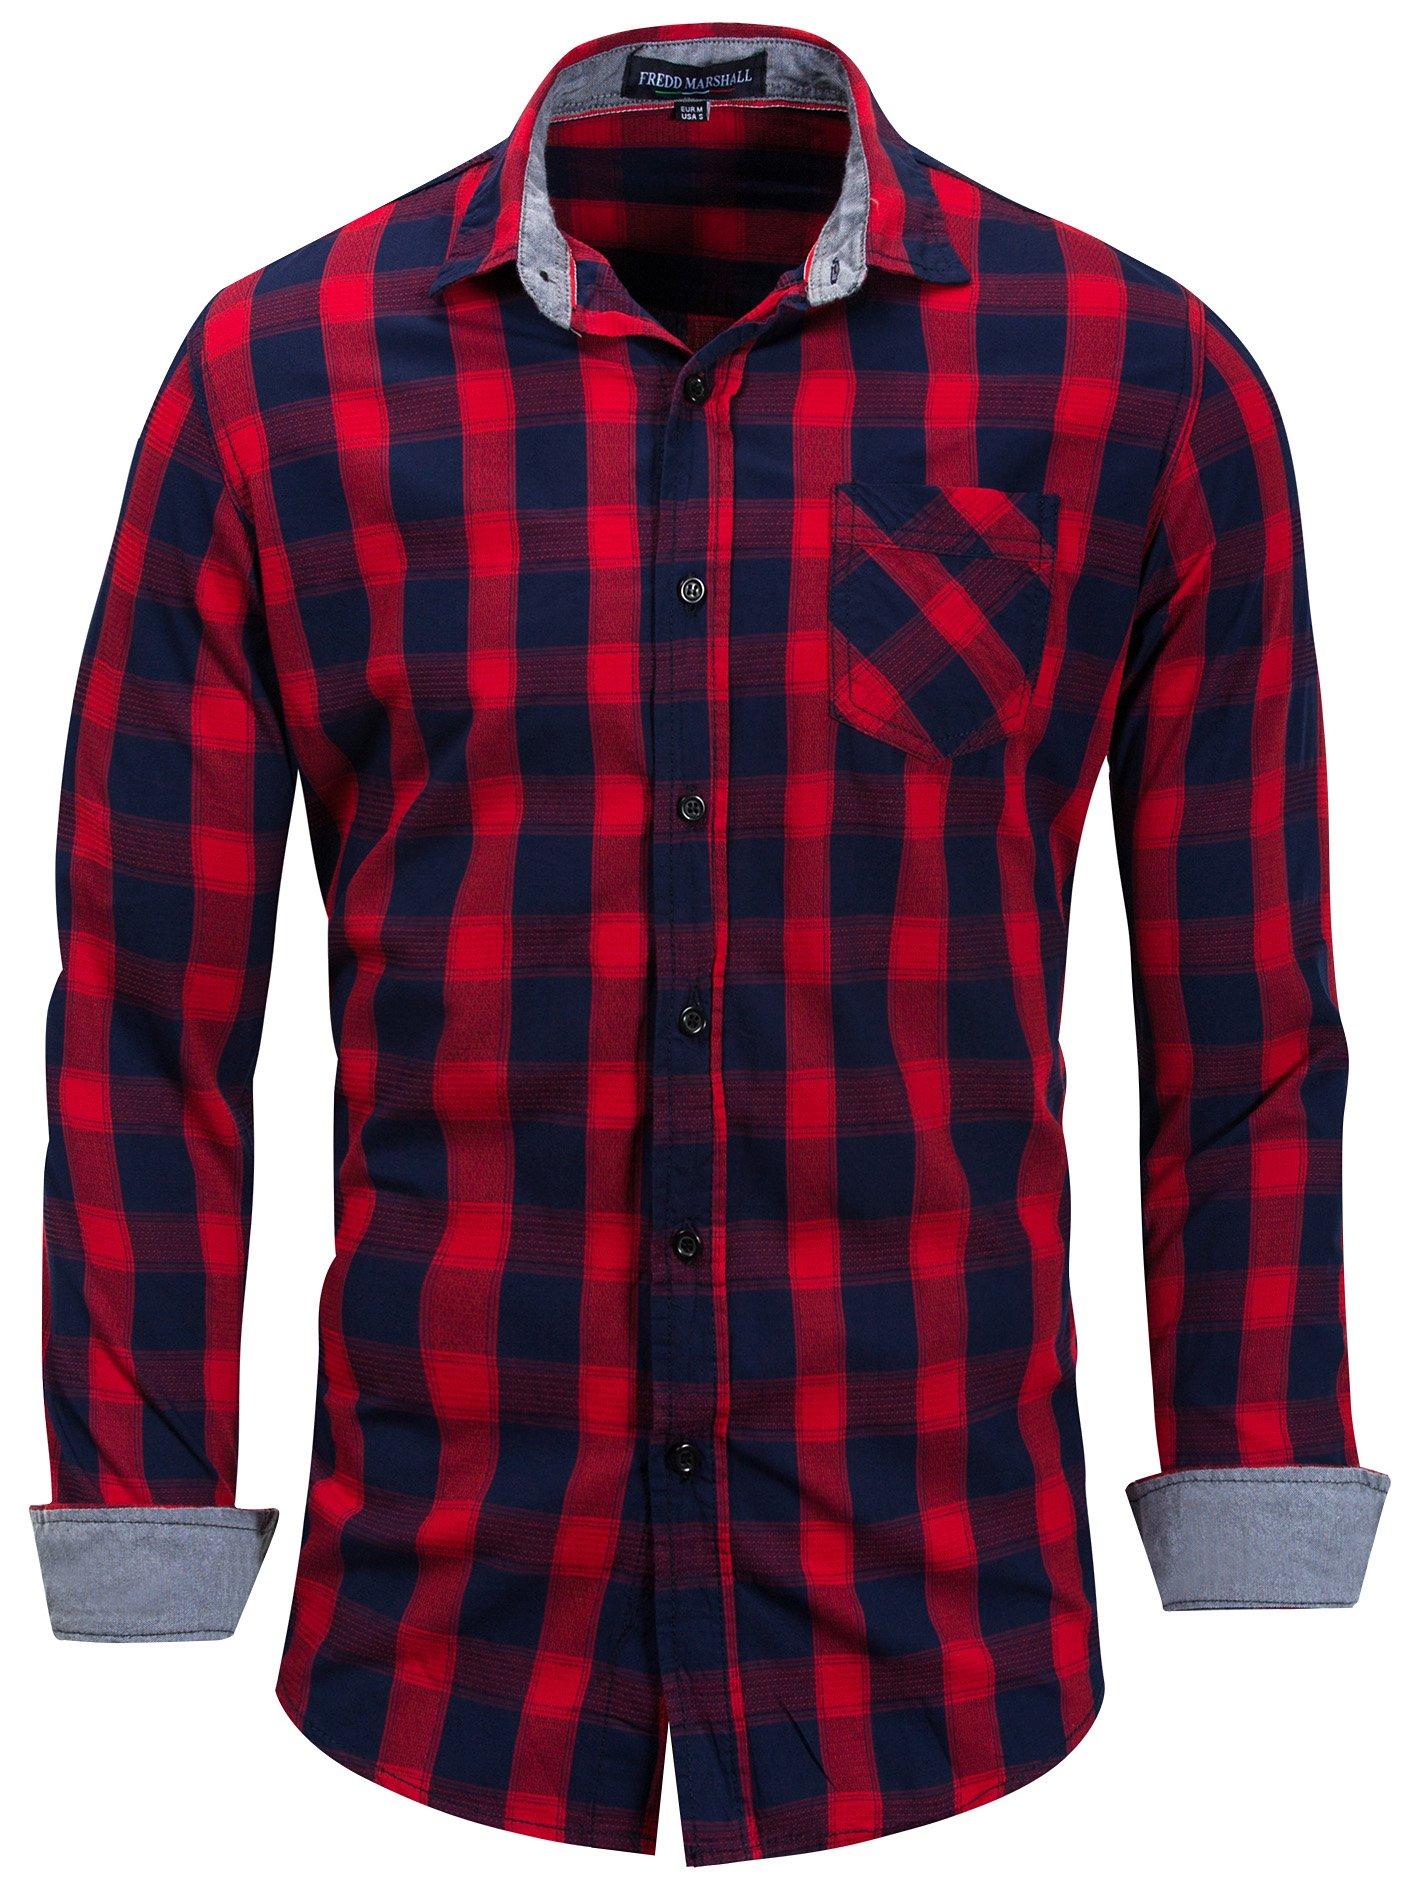 Neleus Men's Cotton Casual Plaid Long Sleeve Dress Shirt,158,Red,L,EU XL